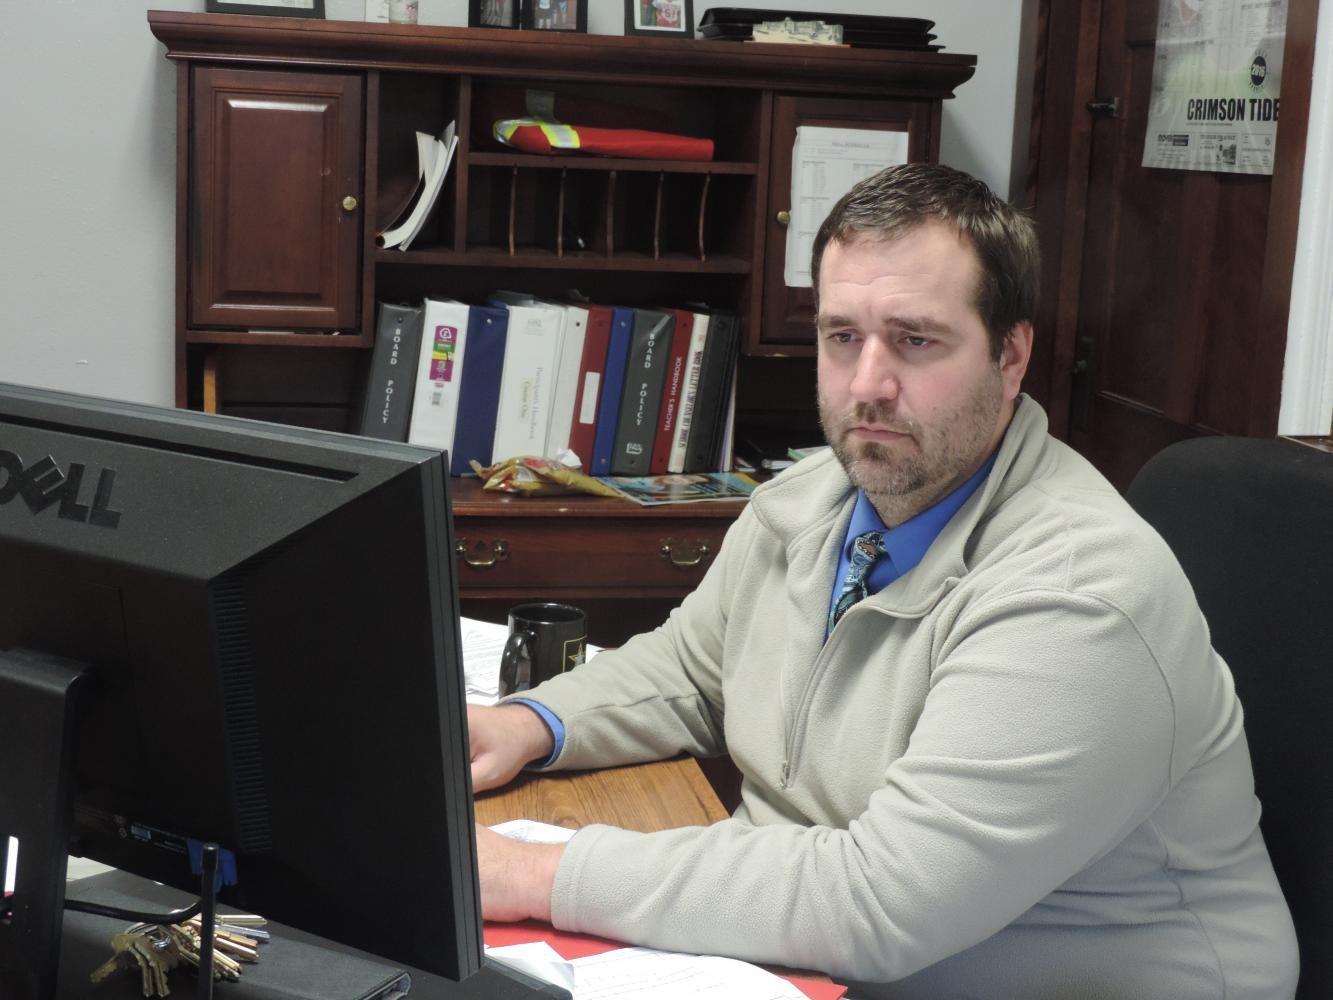 Former High School Vice Principal Fills Job At Hospital Network